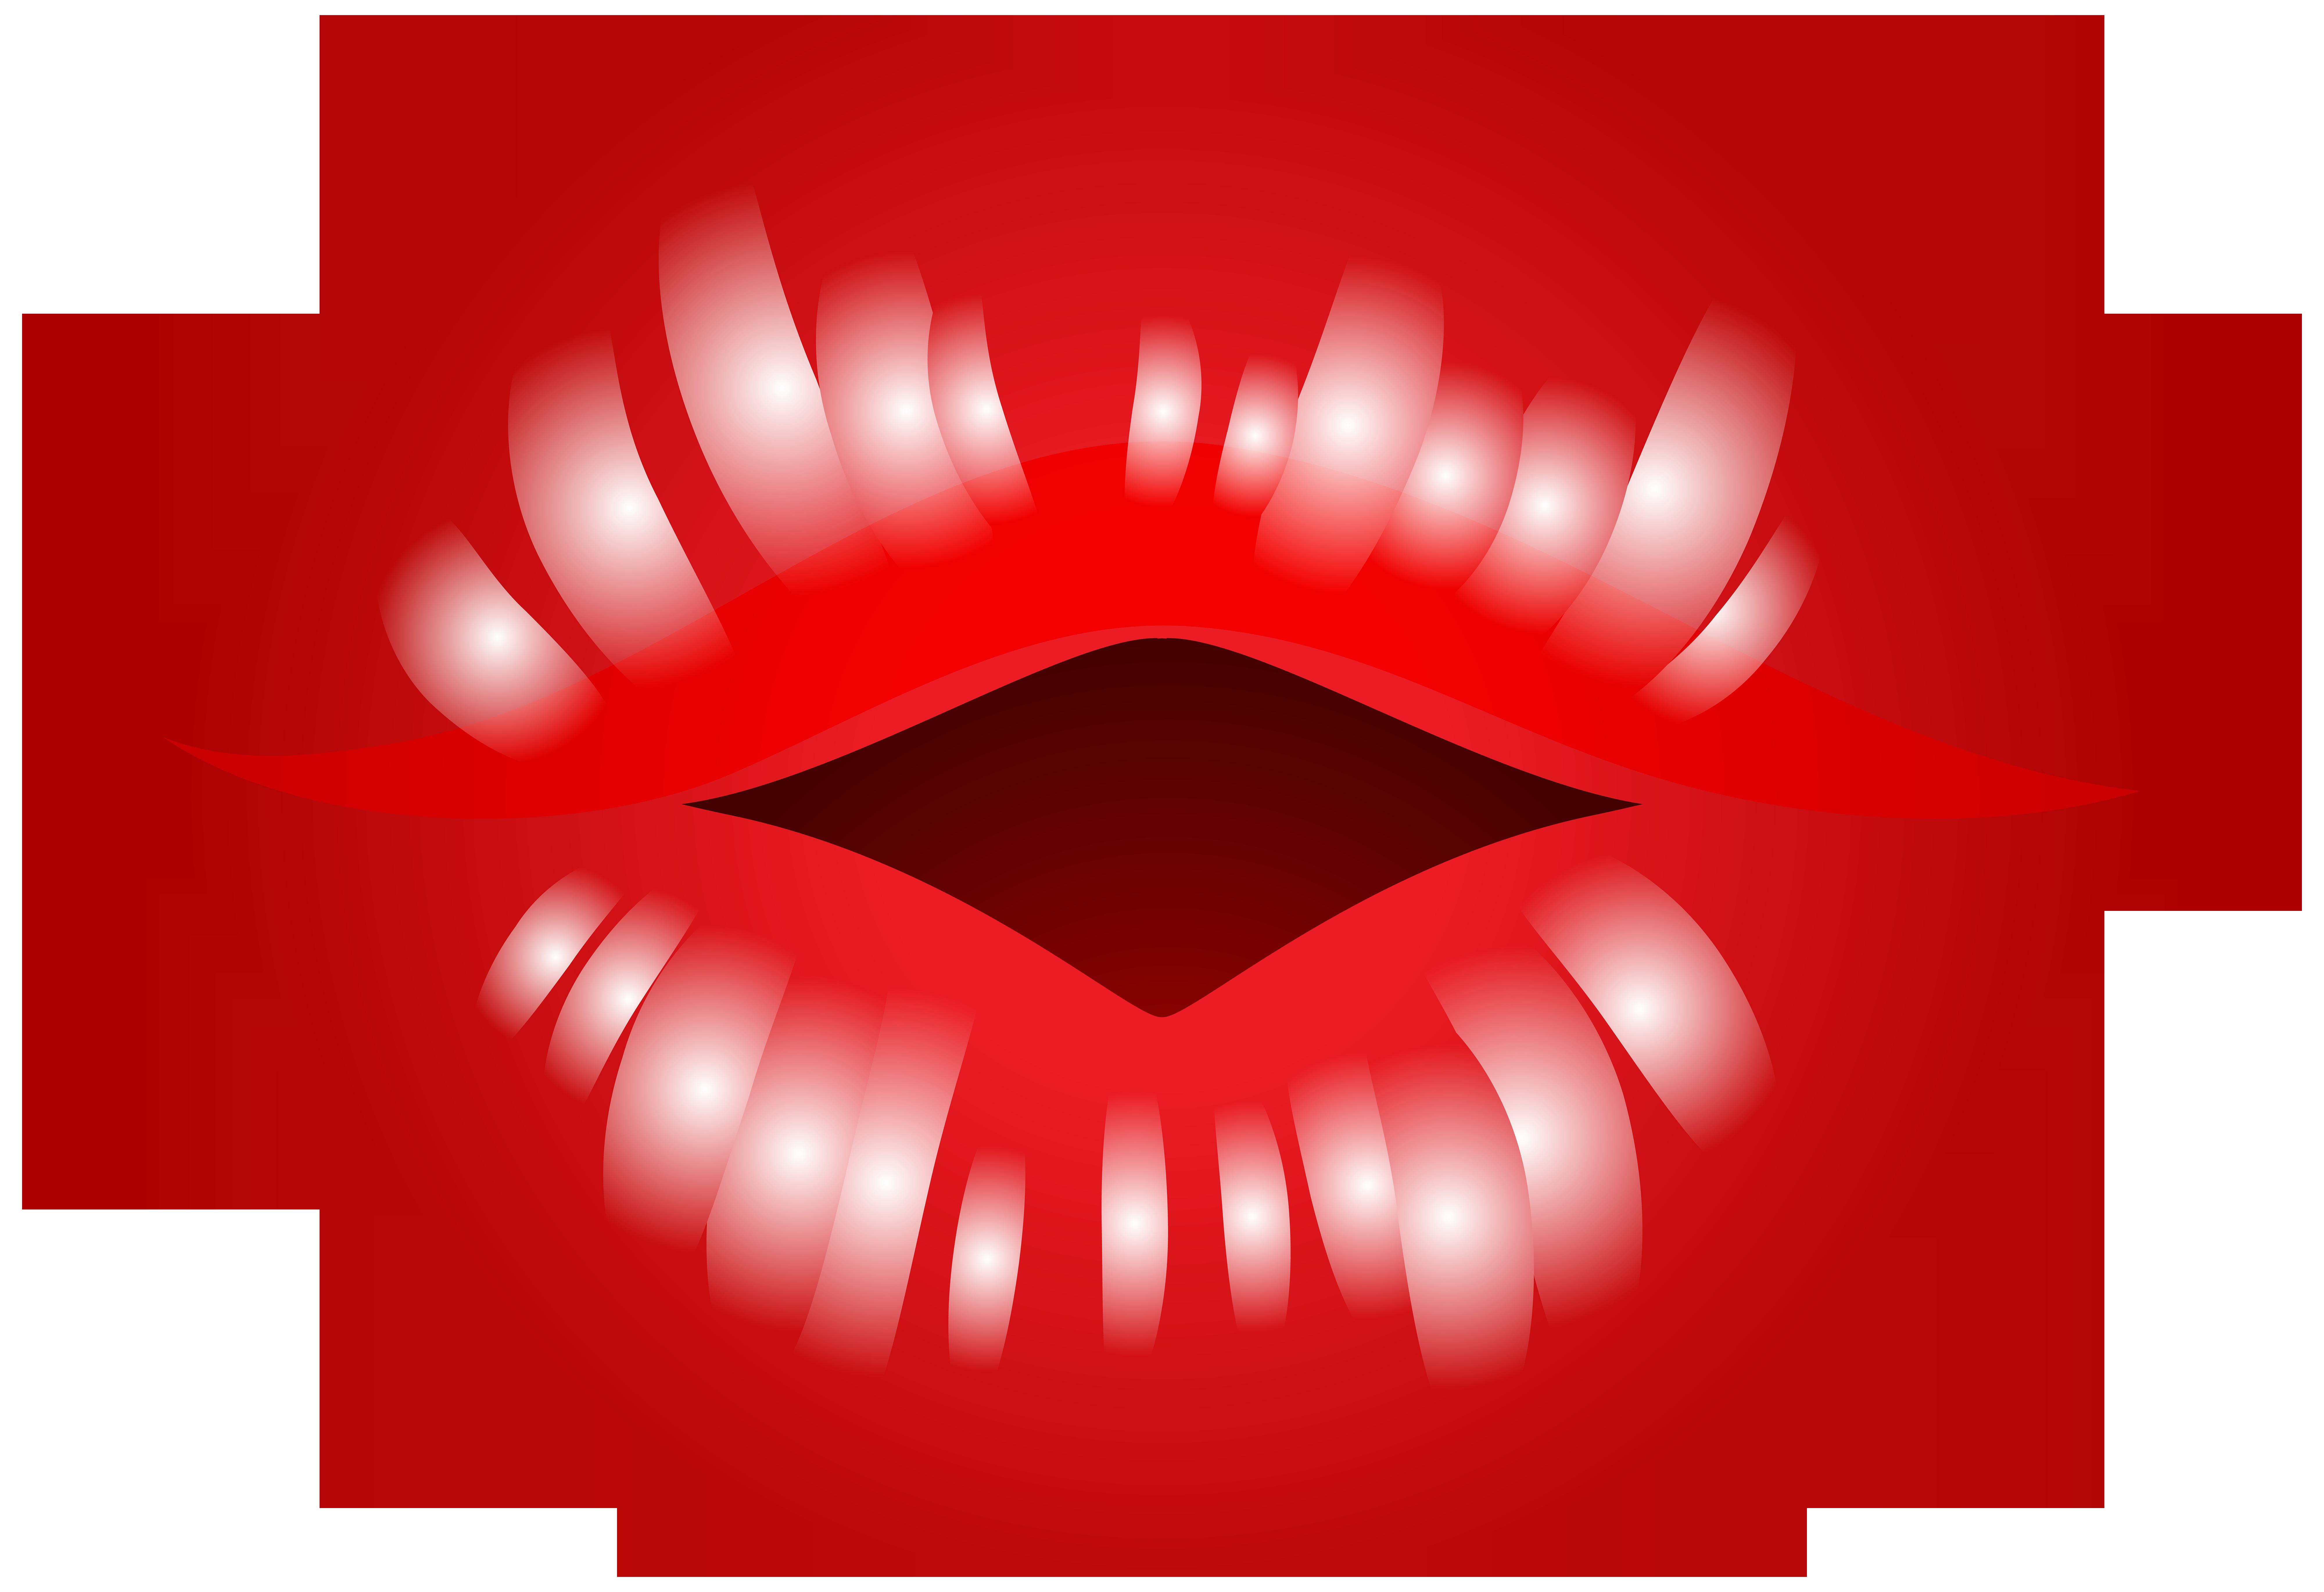 Kiss HD PNG - 116572